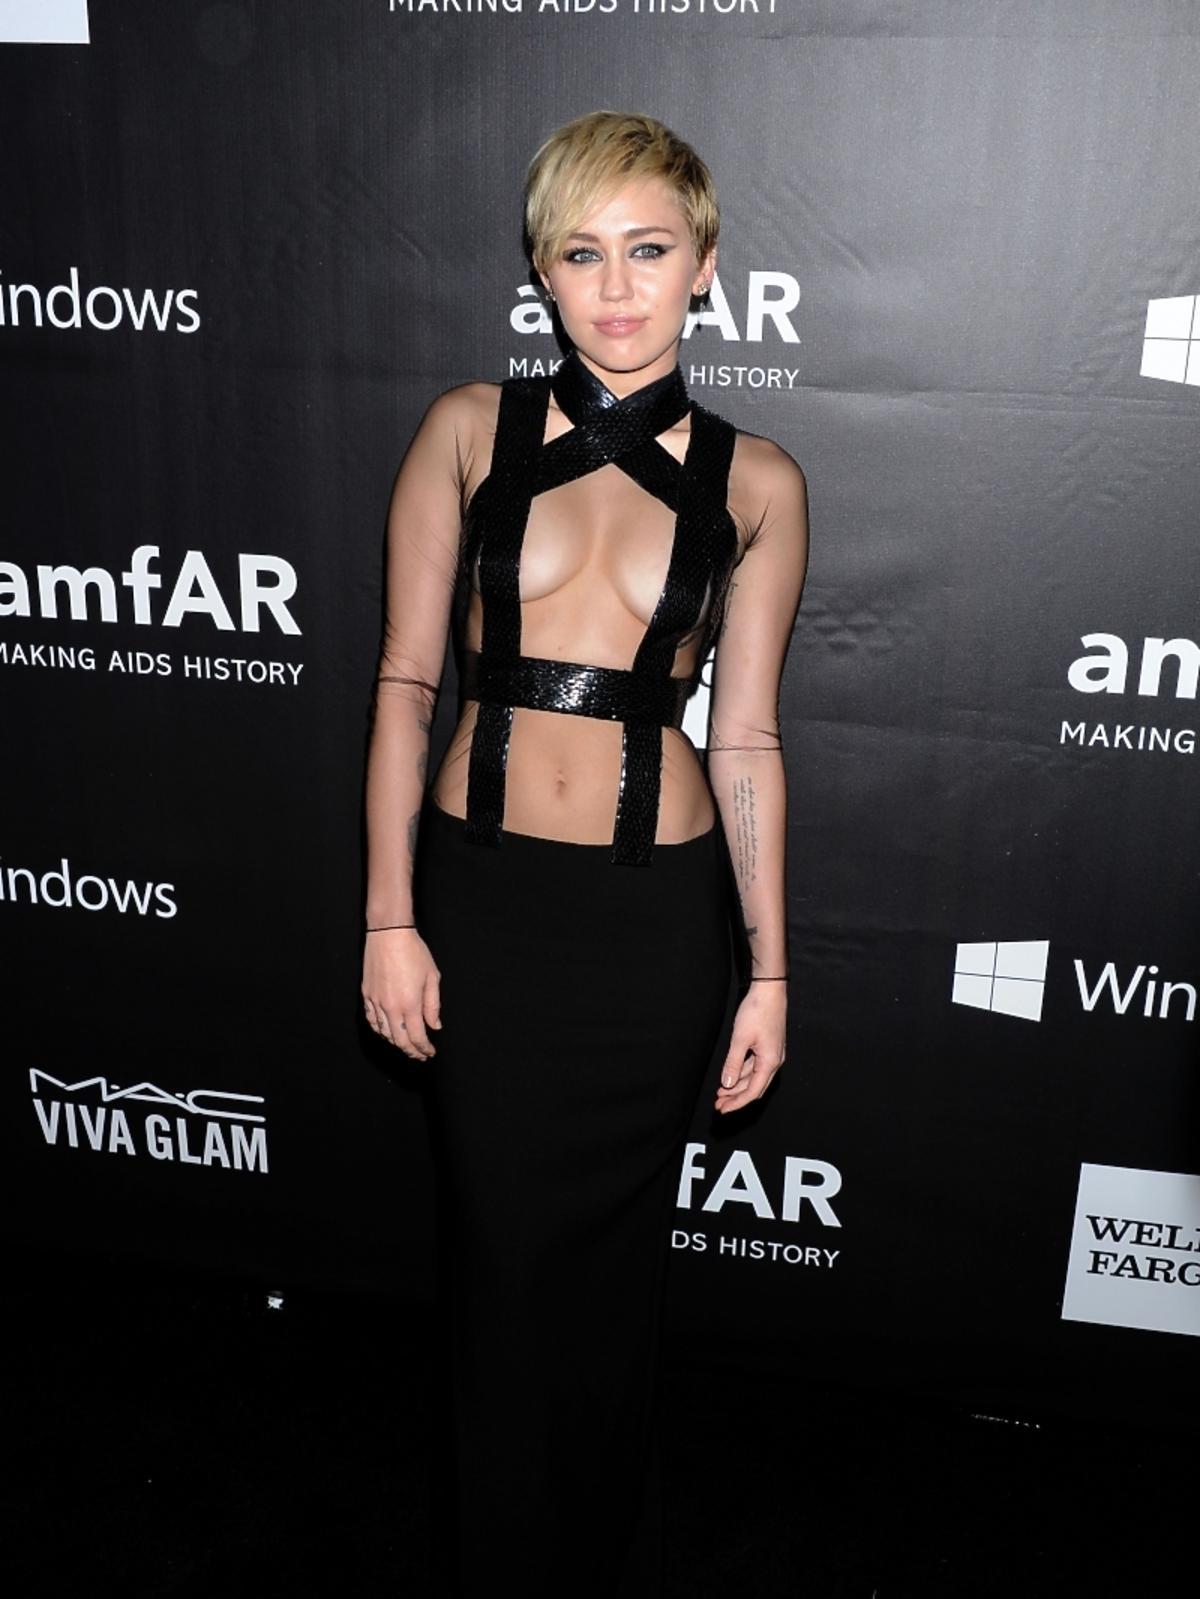 Miley Cyrus na amfAR LA Inspiration Gala 2014